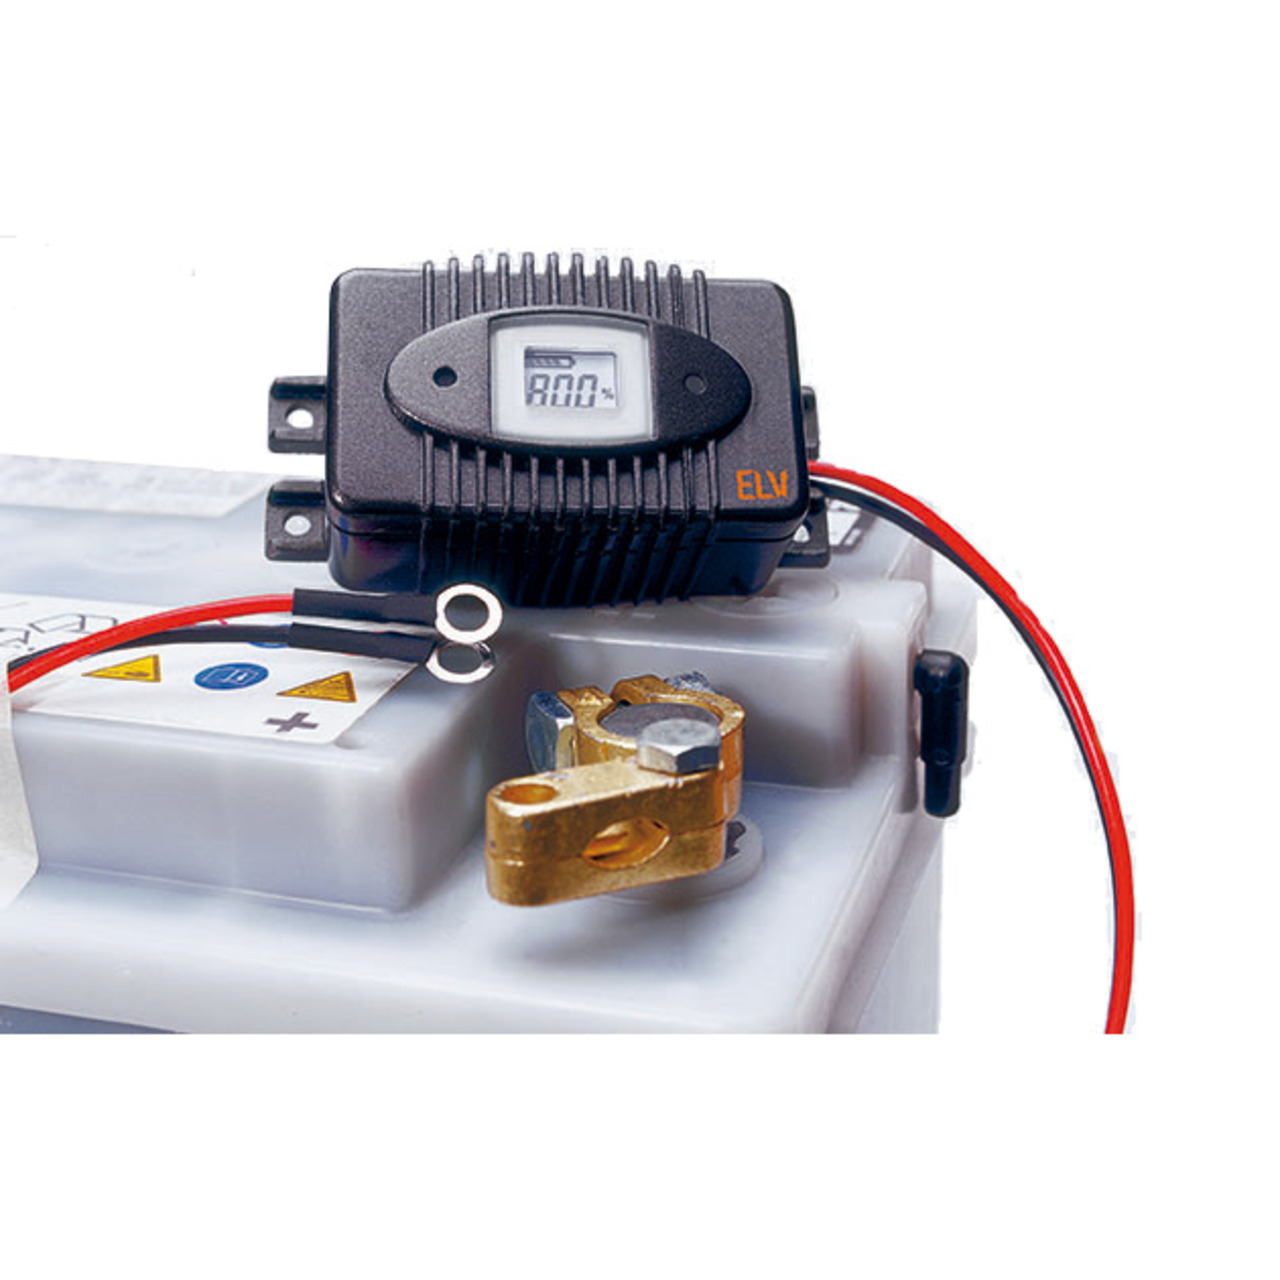 ELV Power Brick PB 500 Blei-Akku-Informationssystem mit Aktivator